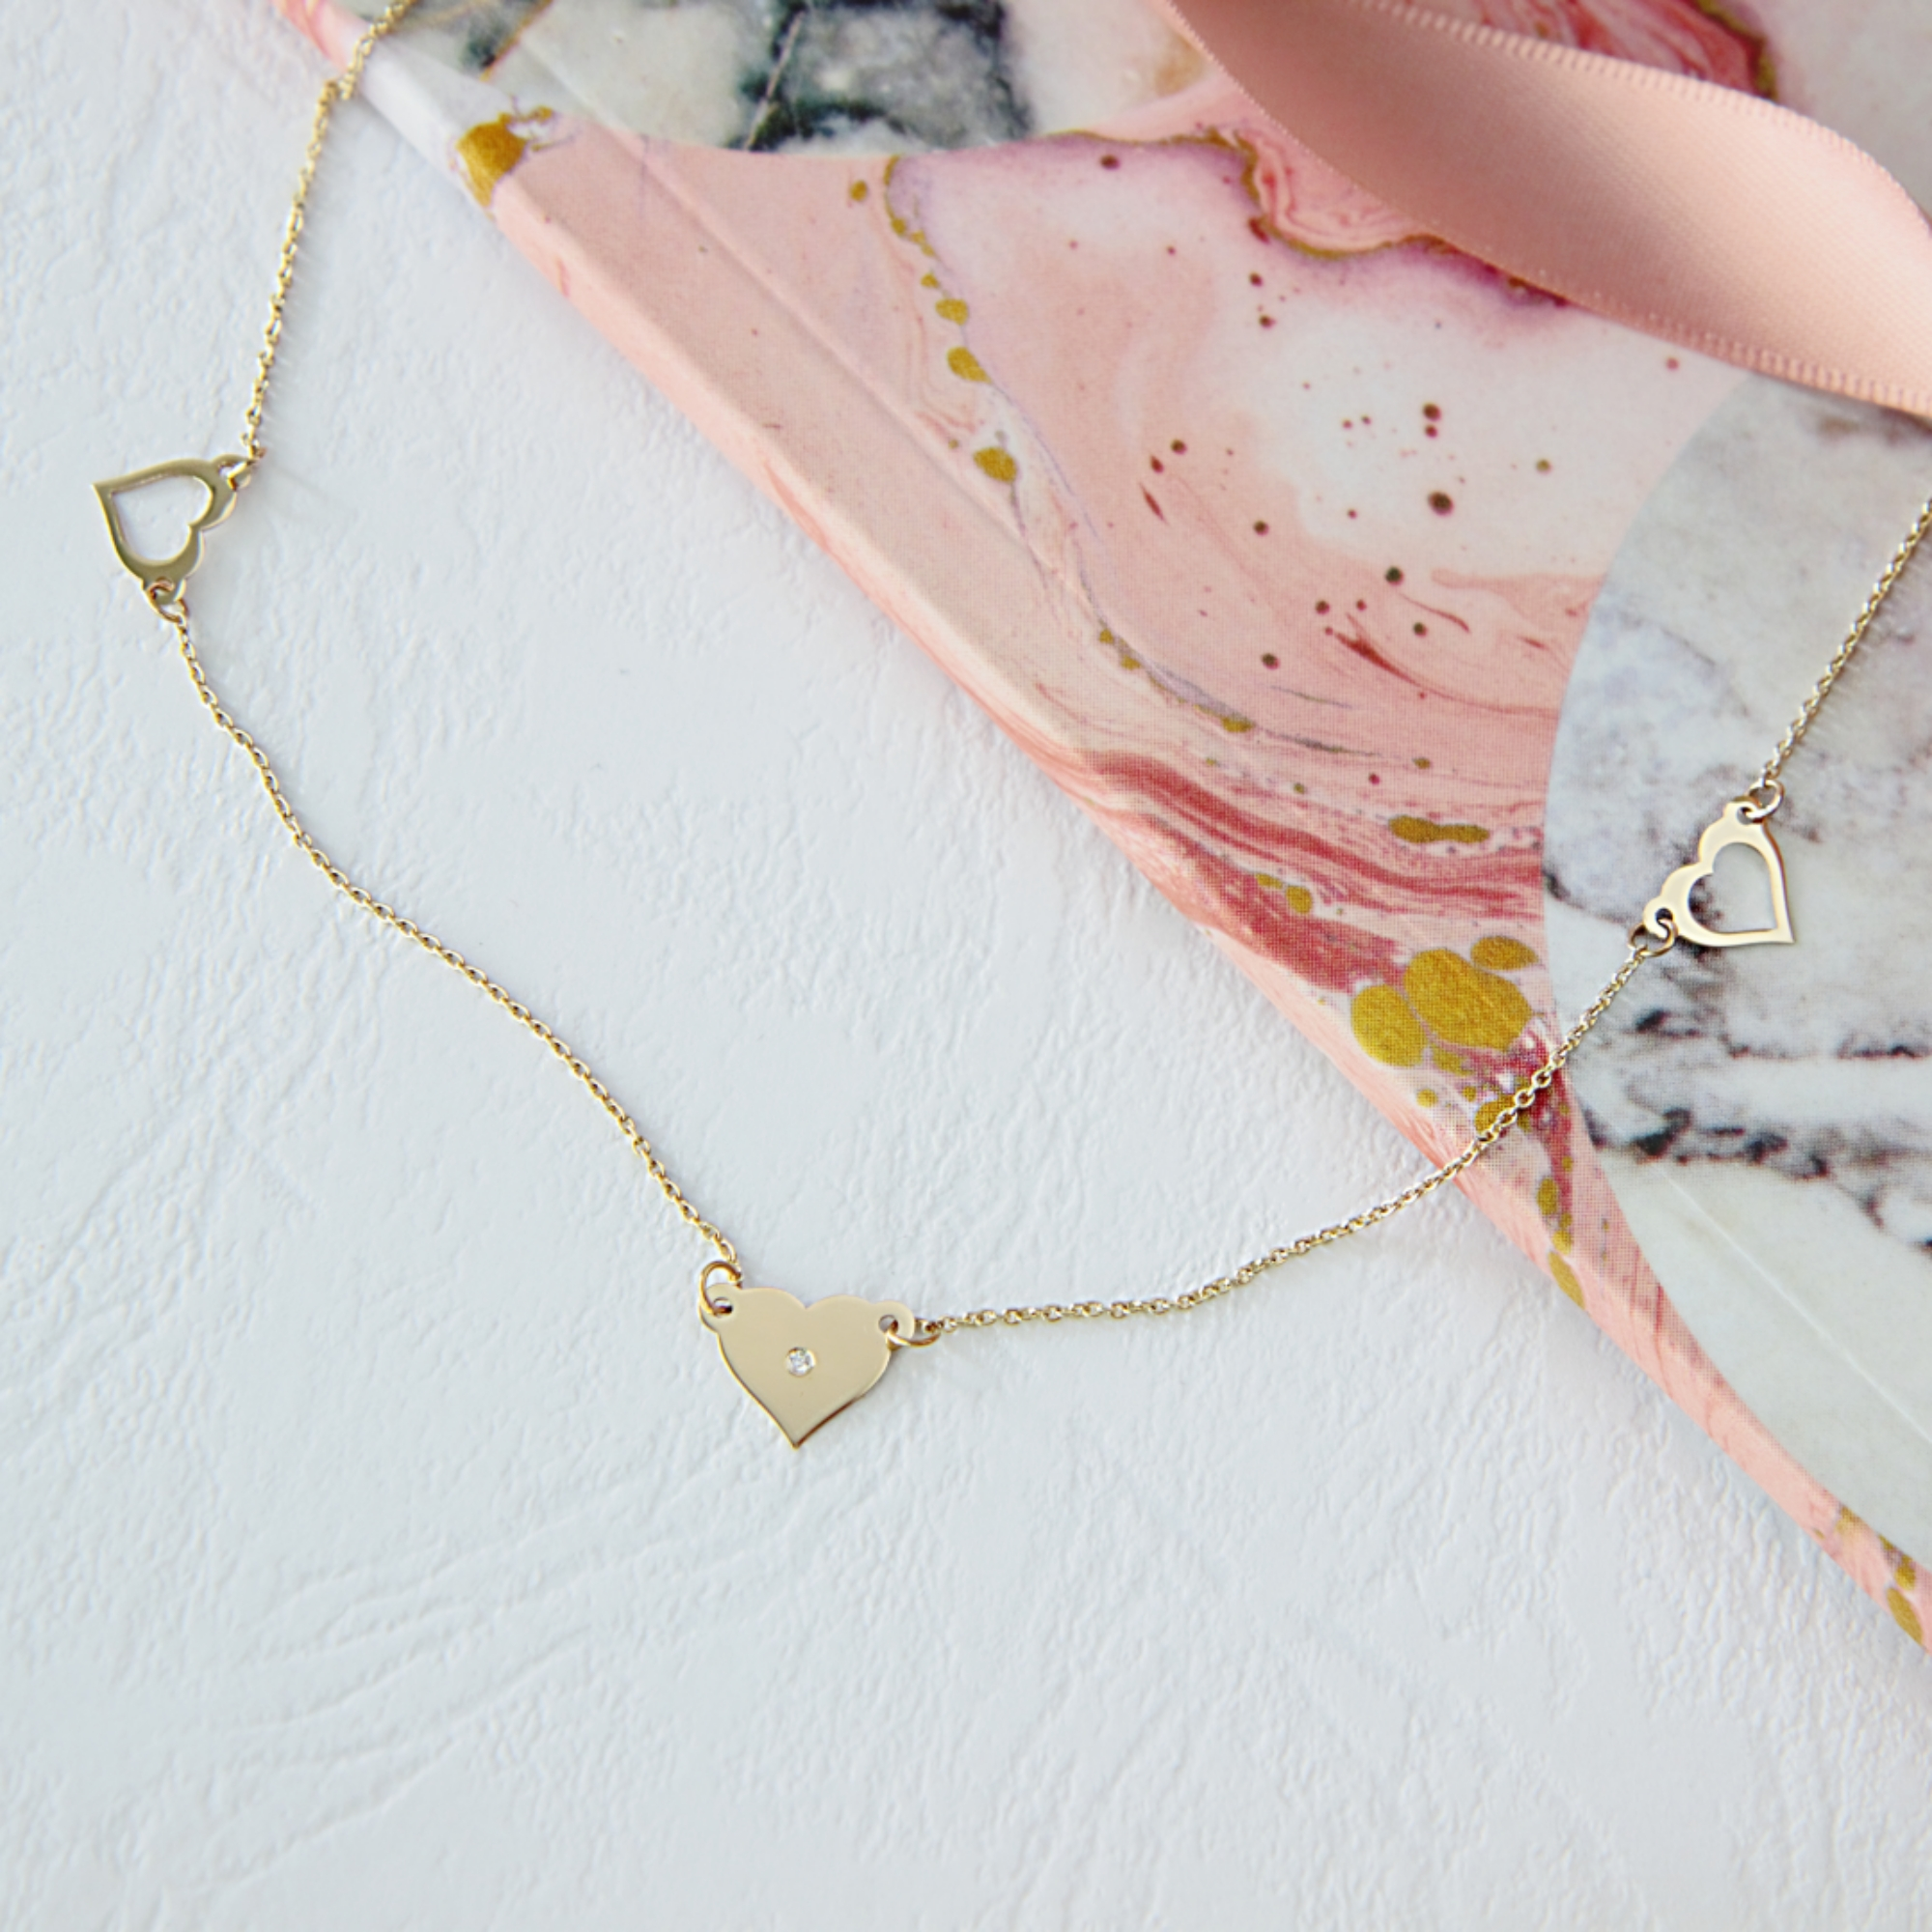 Colier din aur 14K cu model inimioare si diamant 1,25 mm